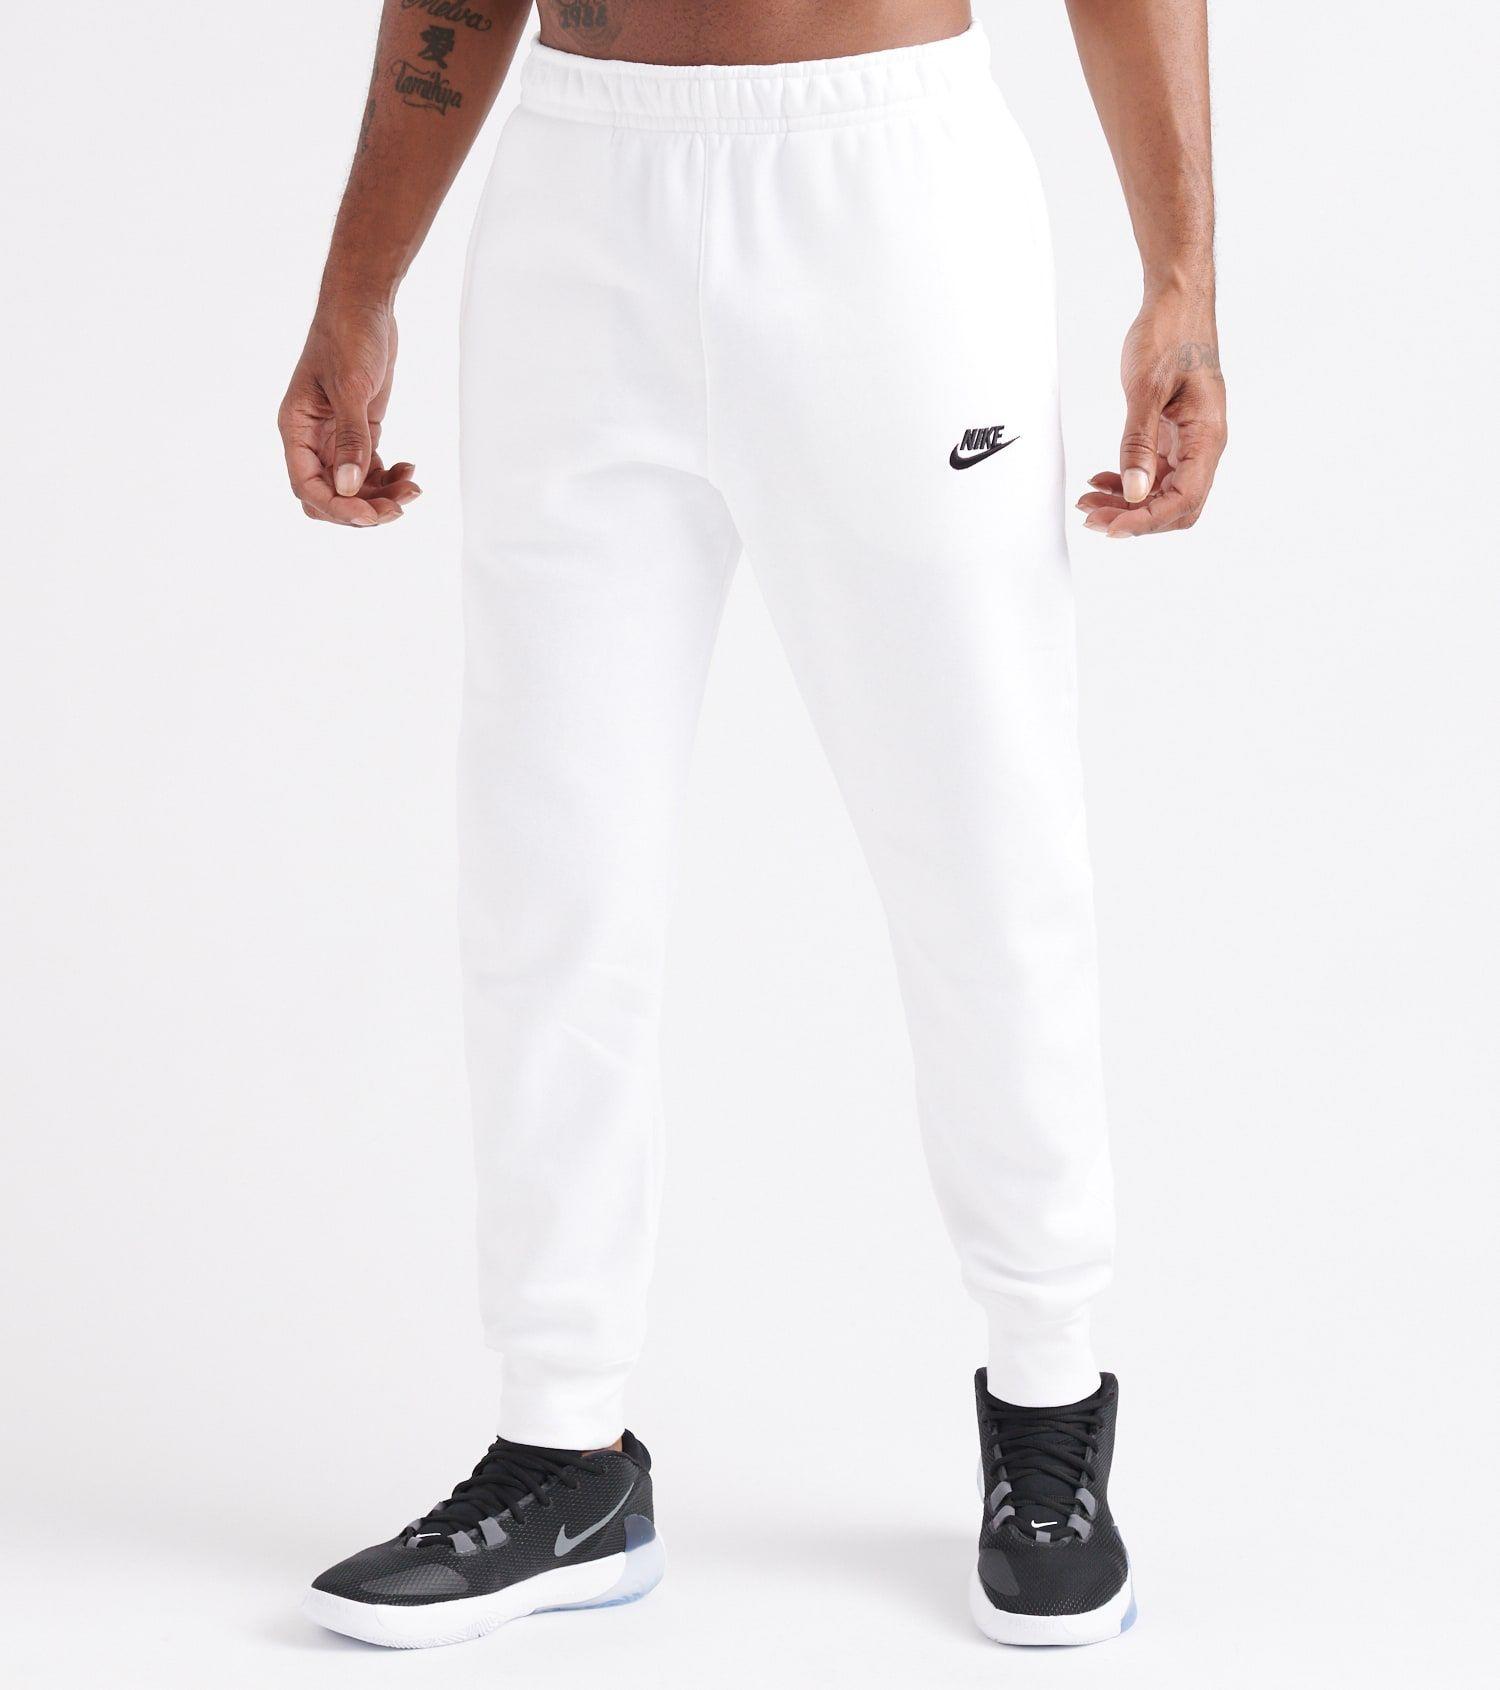 Palacio Hassy evolución  NSW Club Jogger | Nike outfits, White joggers, Mens sportswear